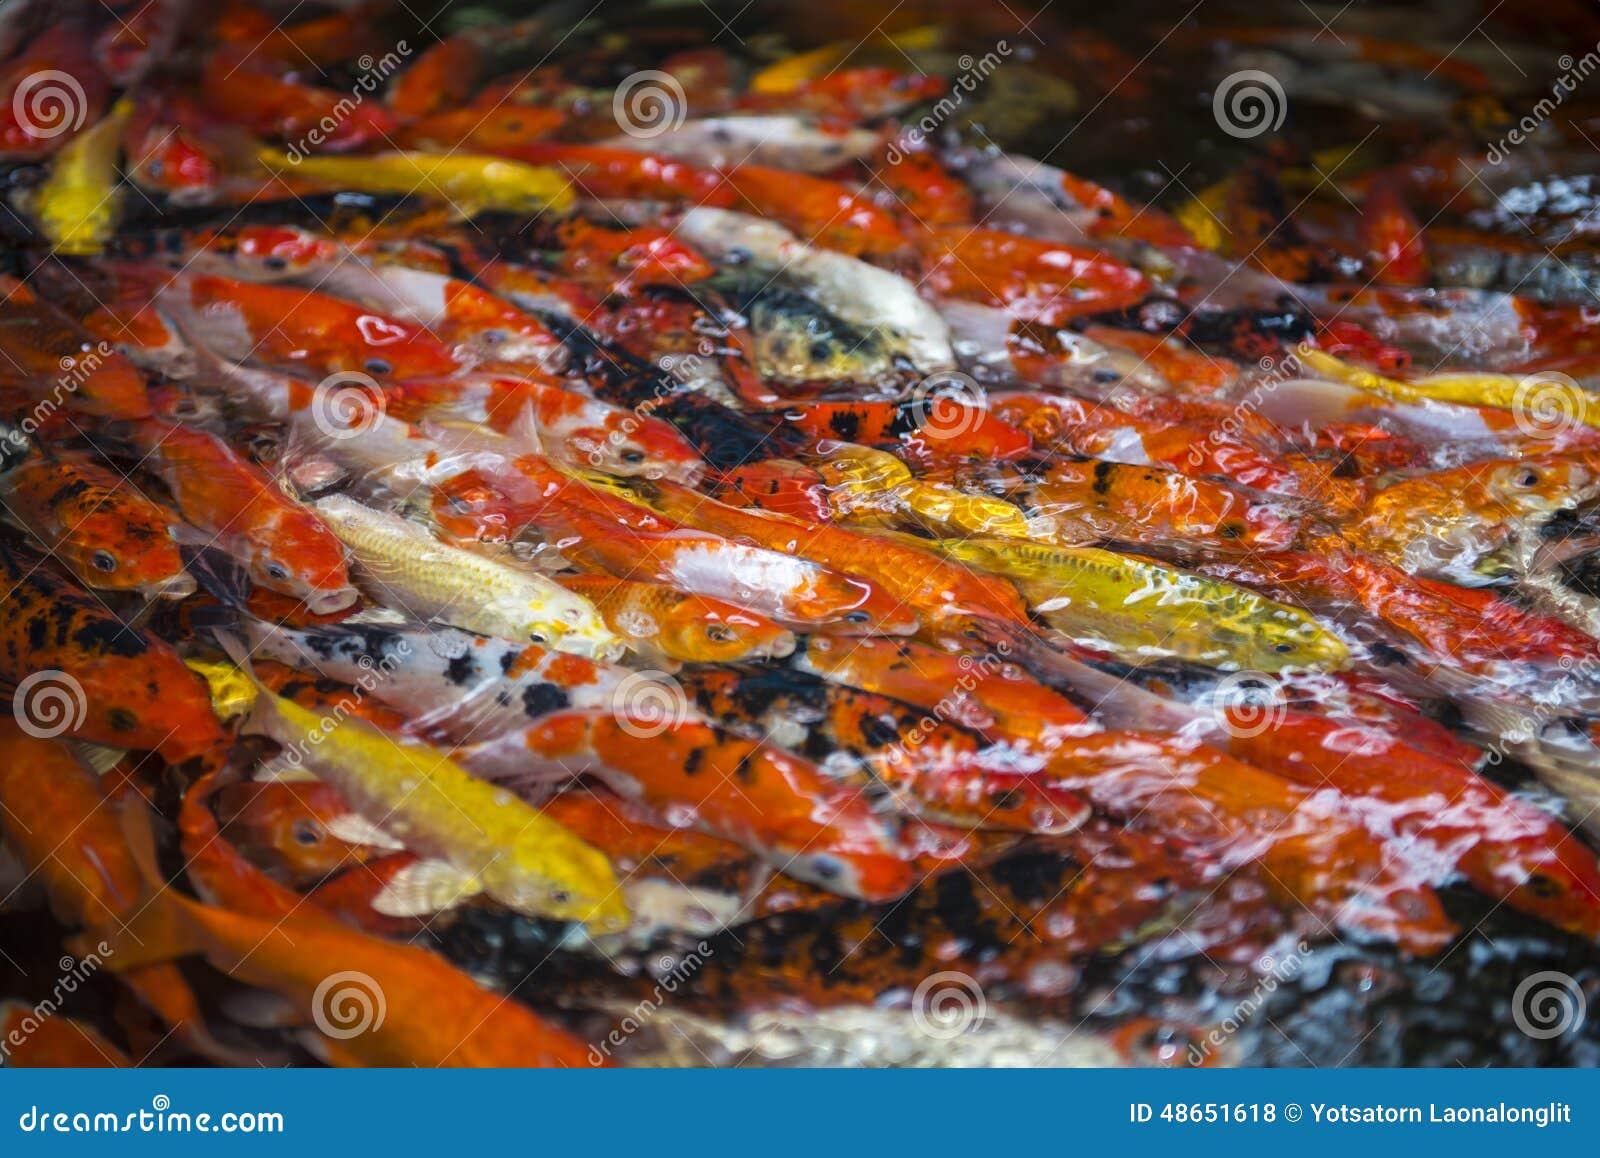 Japanese carps royalty free stock photo cartoondealer for Koi fish dealers